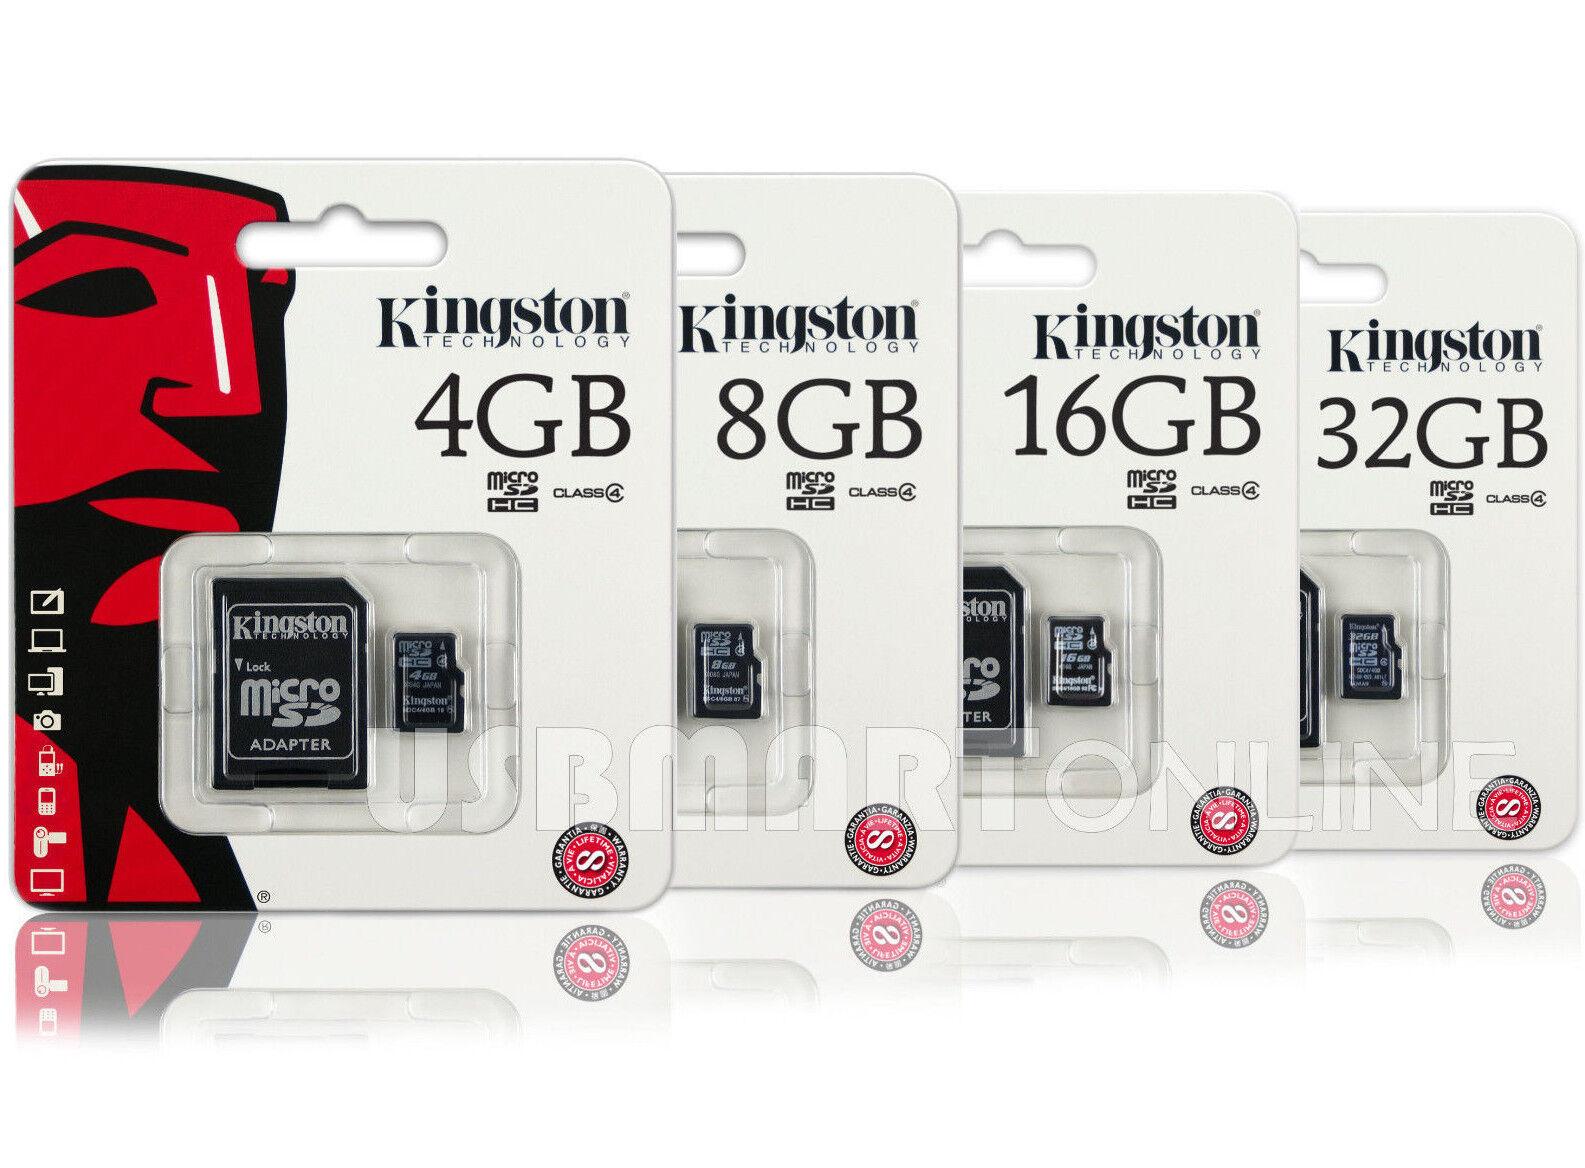 Kingston 4GB 8GB 16GB 32GB Micro SD SDHC Class 4 Flash Memory Card Pack lot